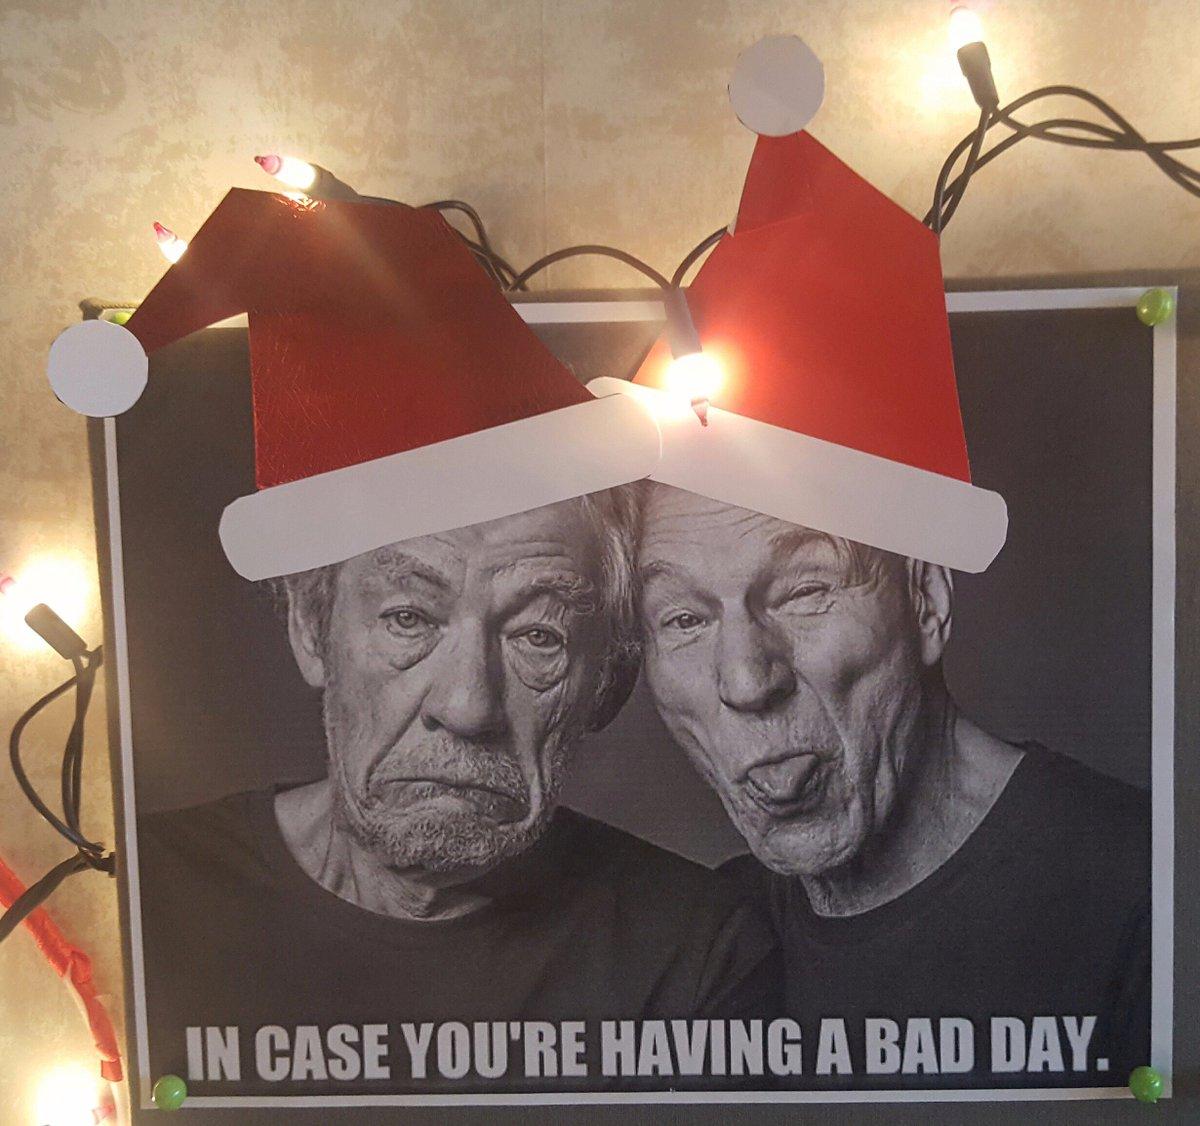 Winning @ decorating the office for Christmas with @SirPatStew & @IanMcKellen. #incaseyourehavingabadday https://t.co/Sw4eCYJvCS